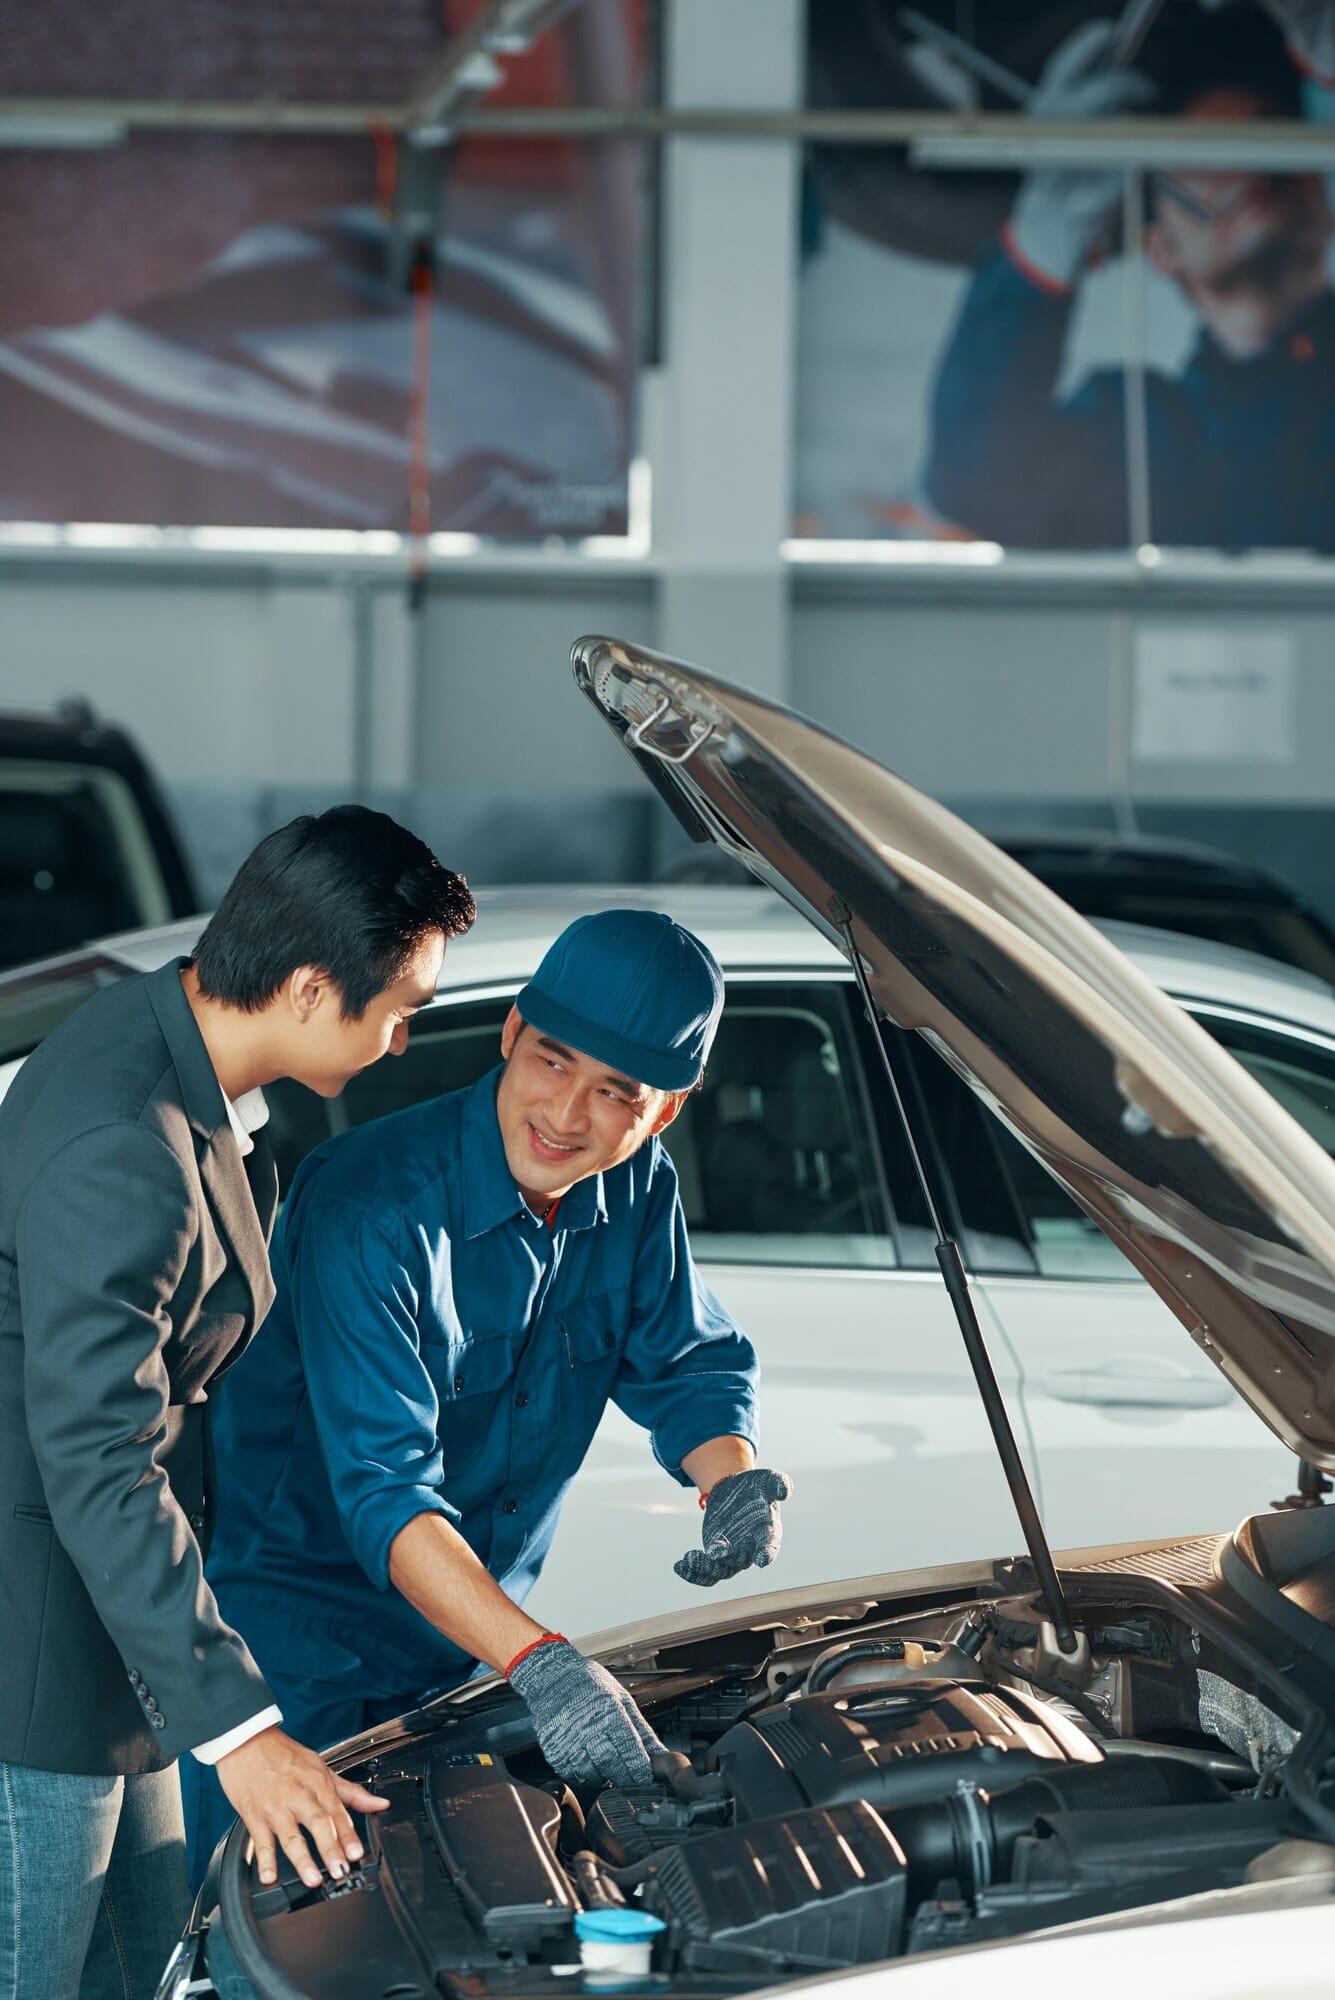 CHecking motor in car service